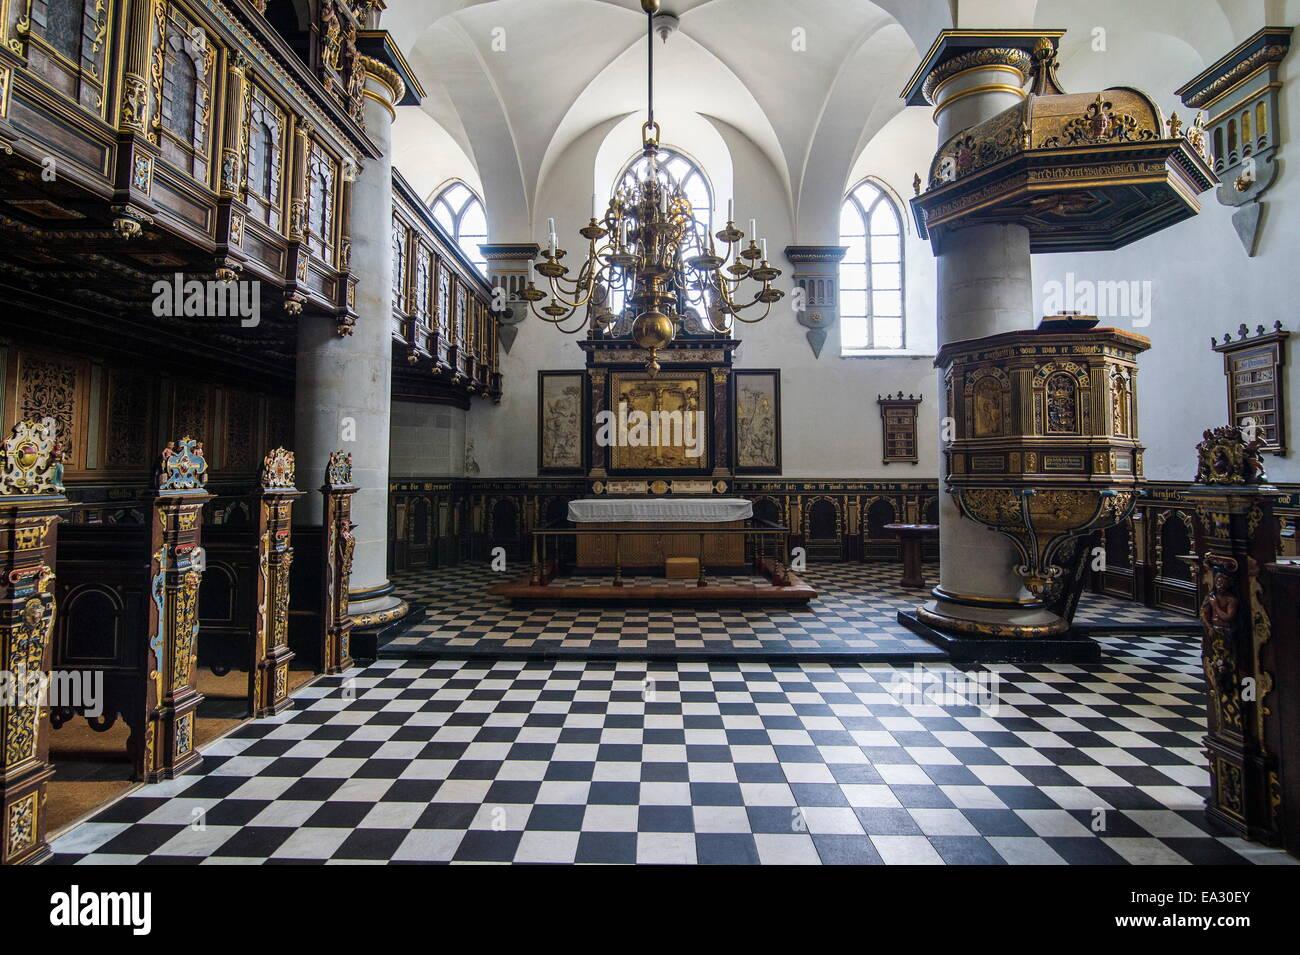 Chapel inside Kronborg renaissance castle, UNESCO World Heritage Site, Helsingor, Denmark, Scandinavia, Europe - Stock Image